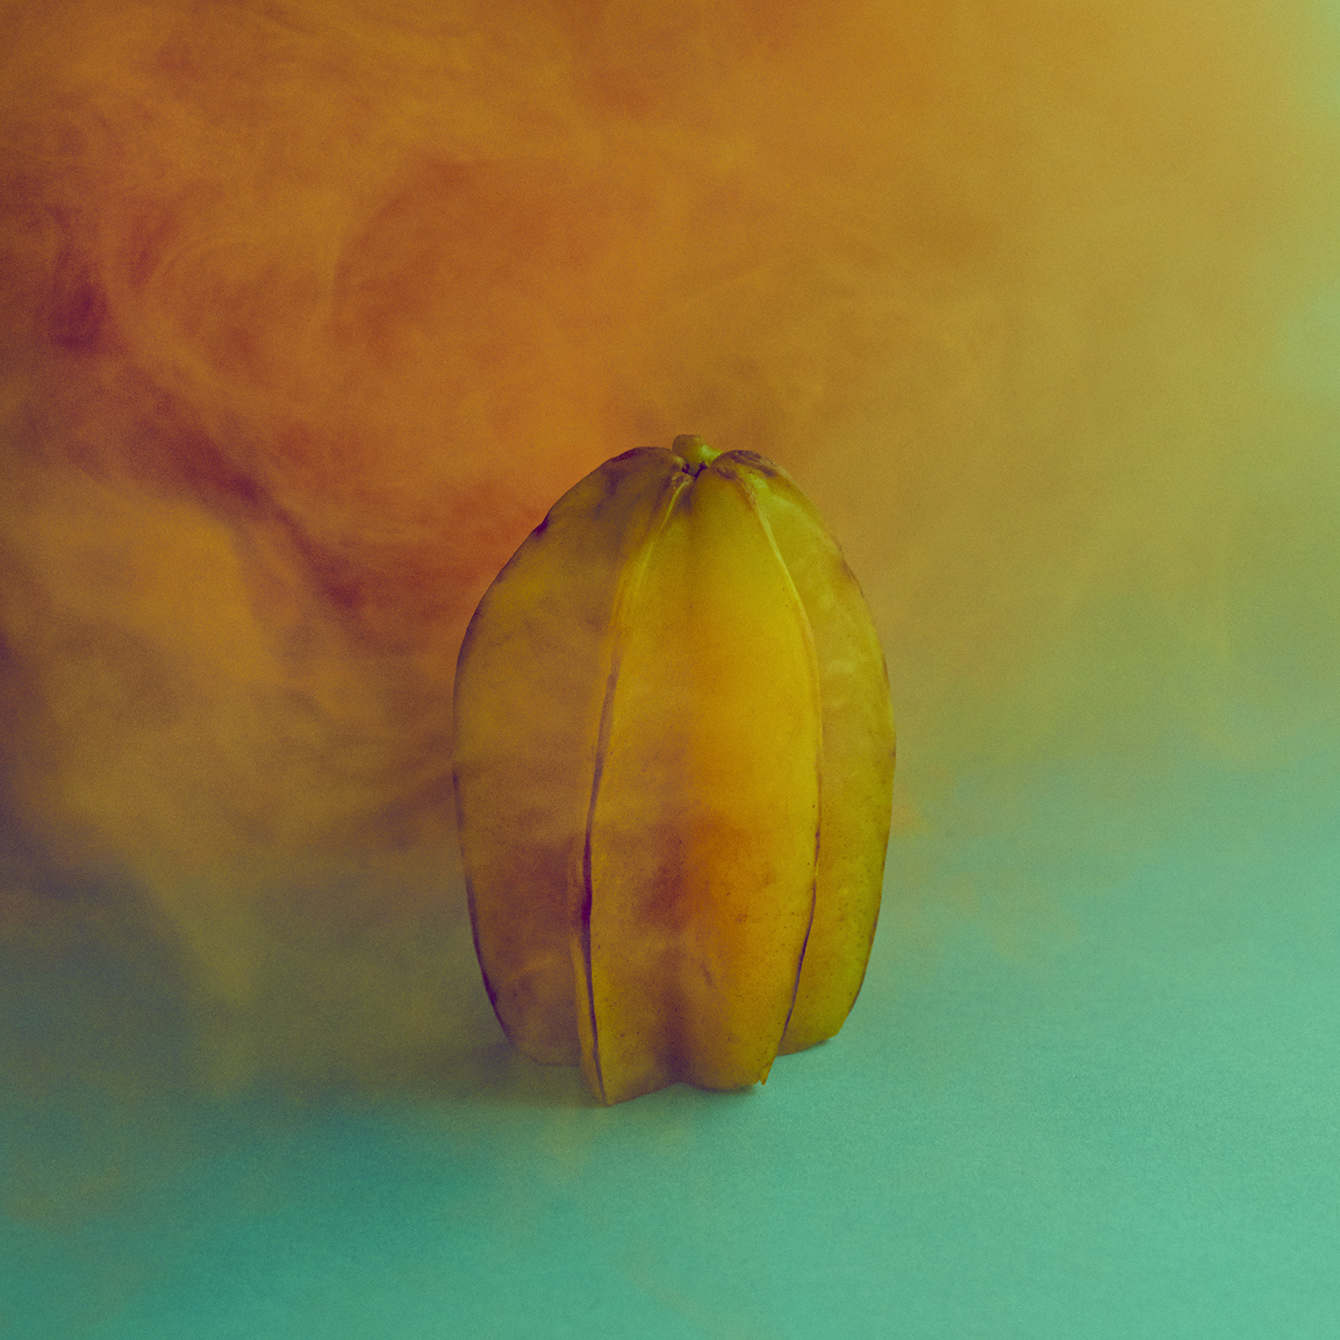 06-starfruit_1340_c.jpg